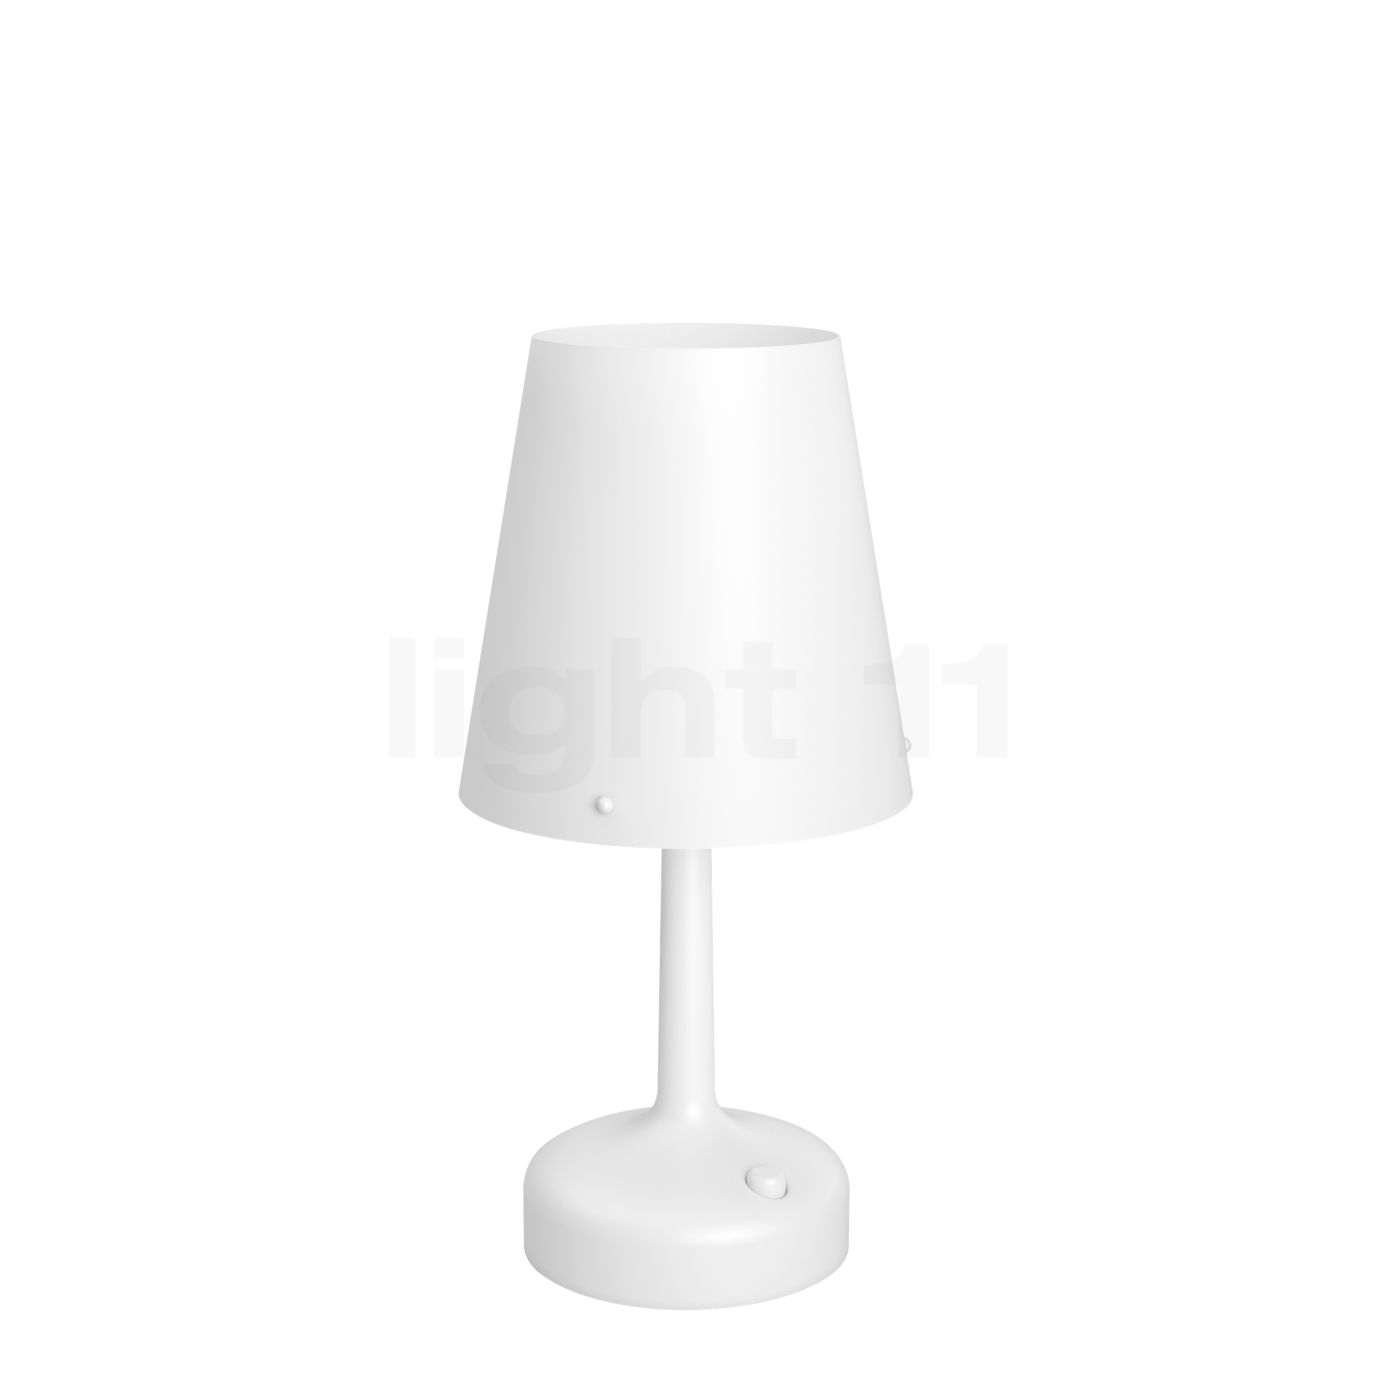 philips moodlighting tischleuchte led kaufen bei. Black Bedroom Furniture Sets. Home Design Ideas